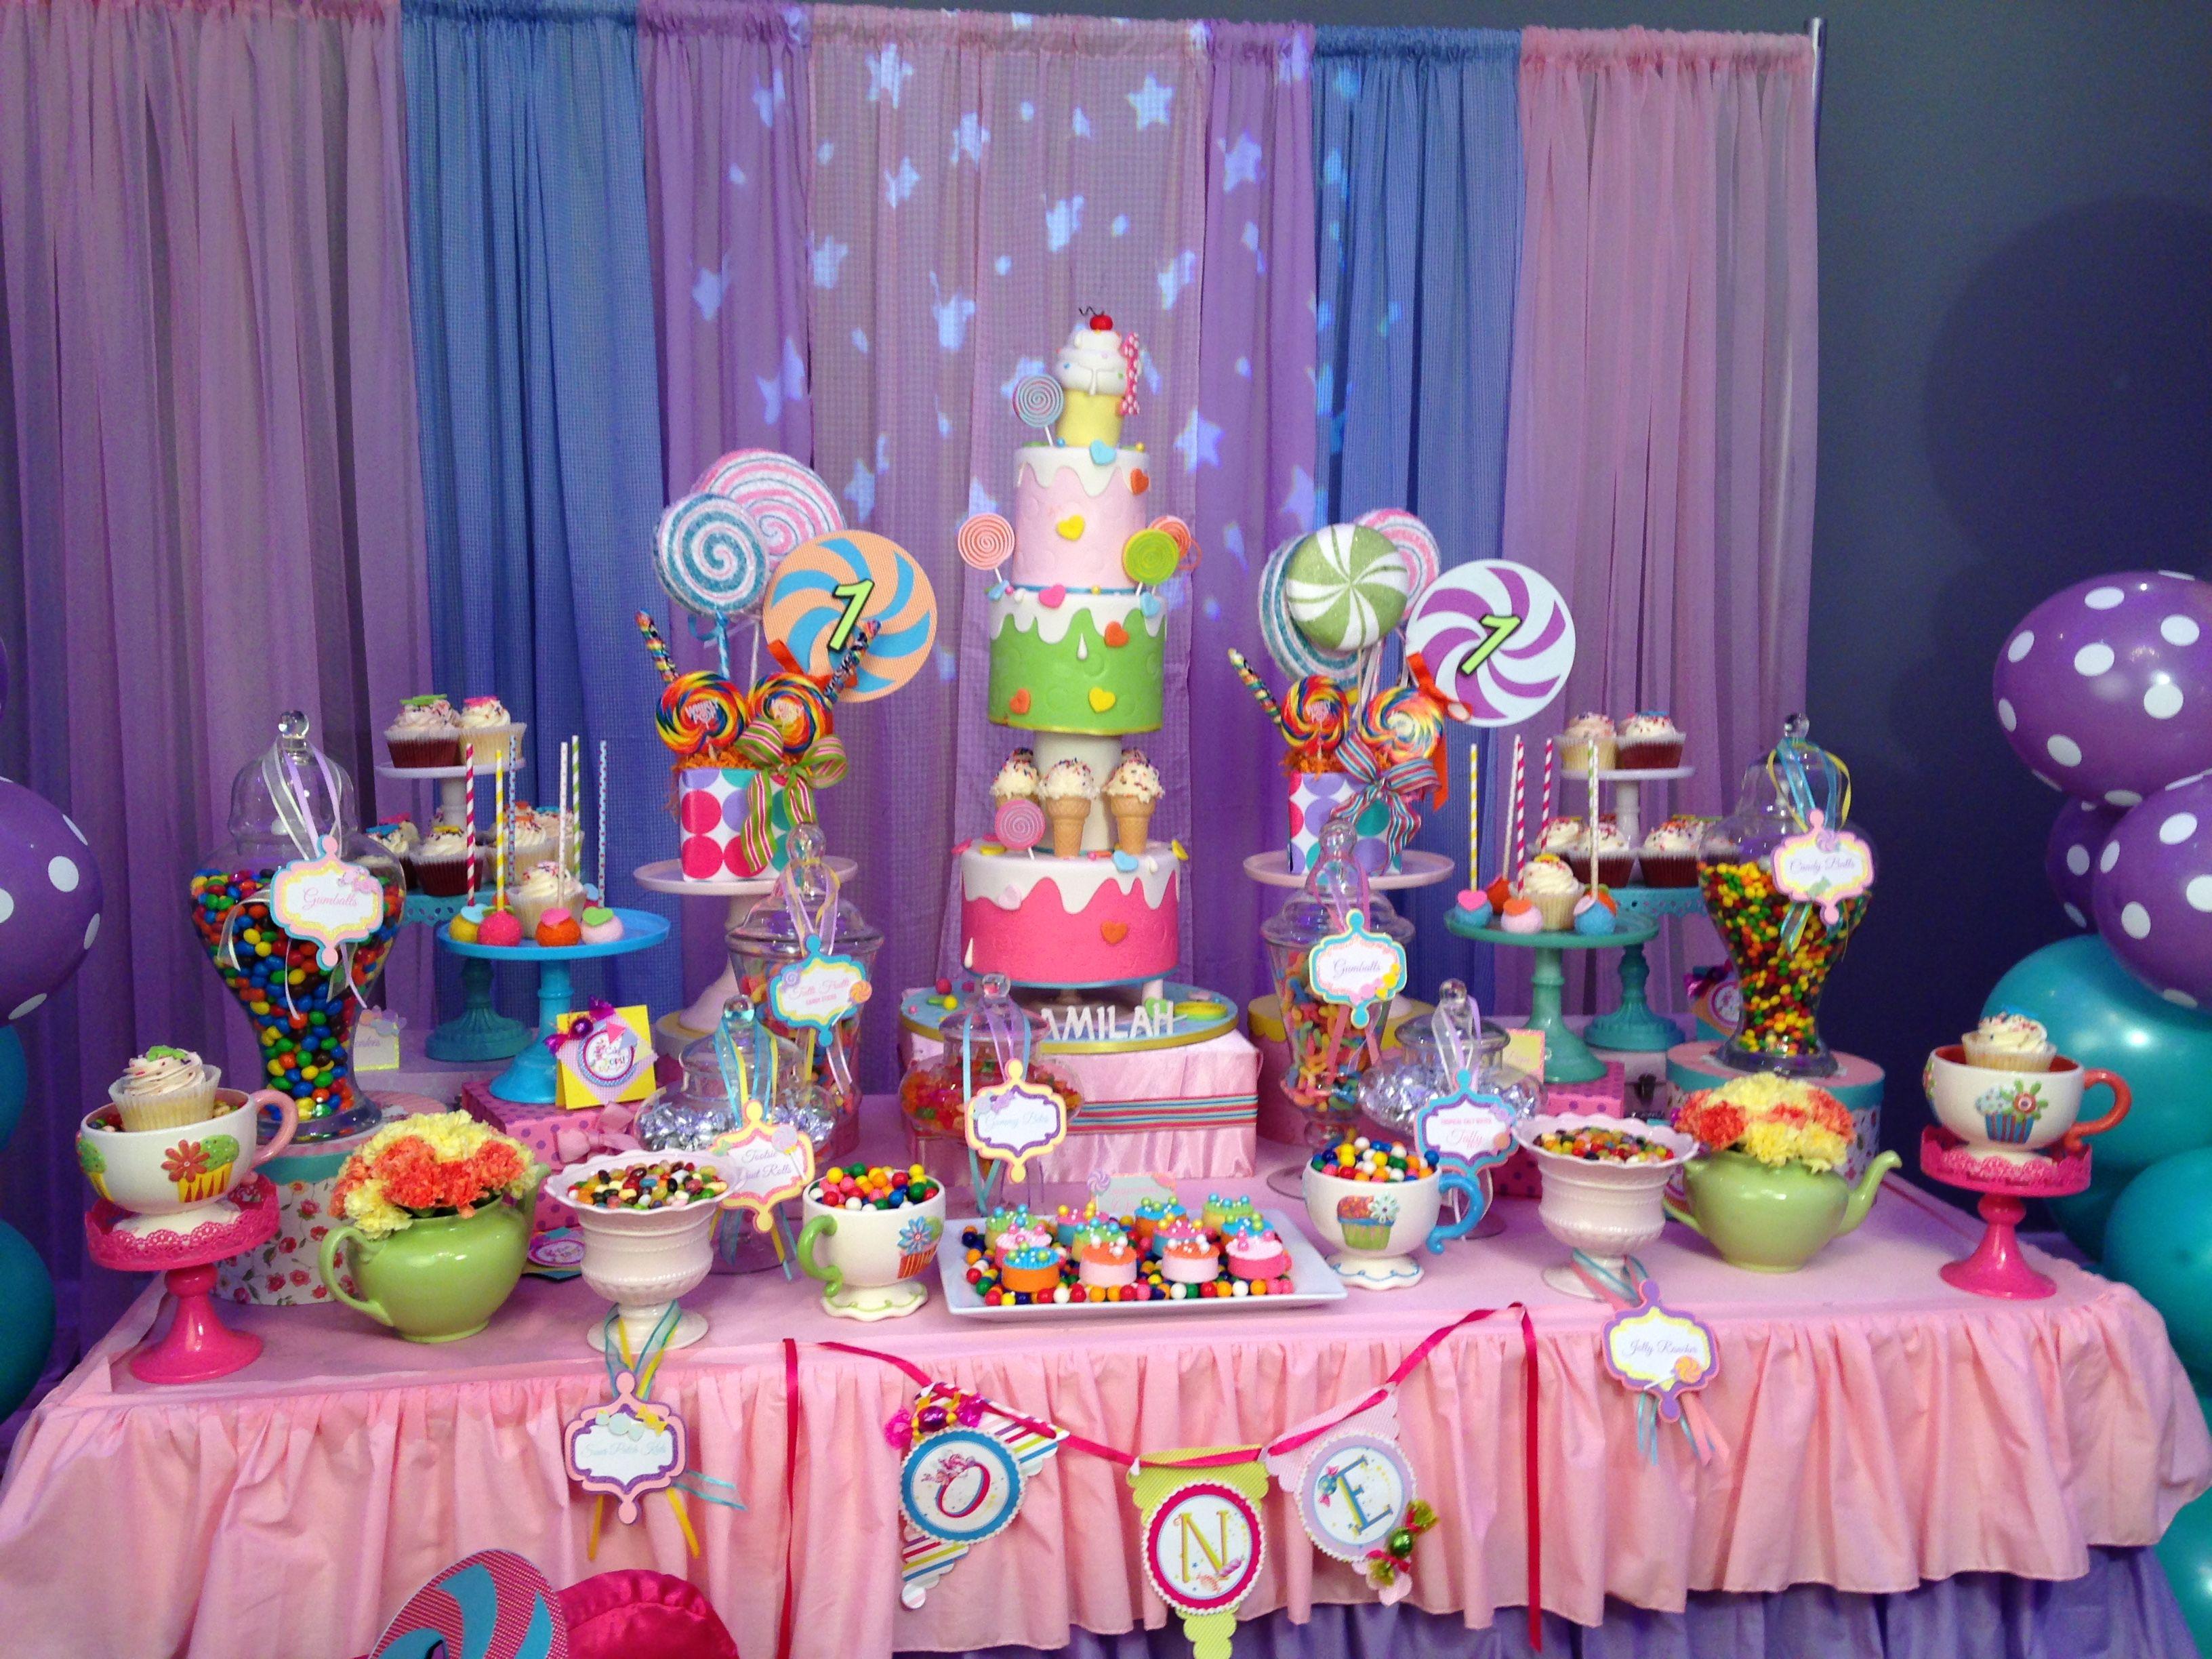 Pin de Mayeline Mena en Candy Land theme party For Amilah ...